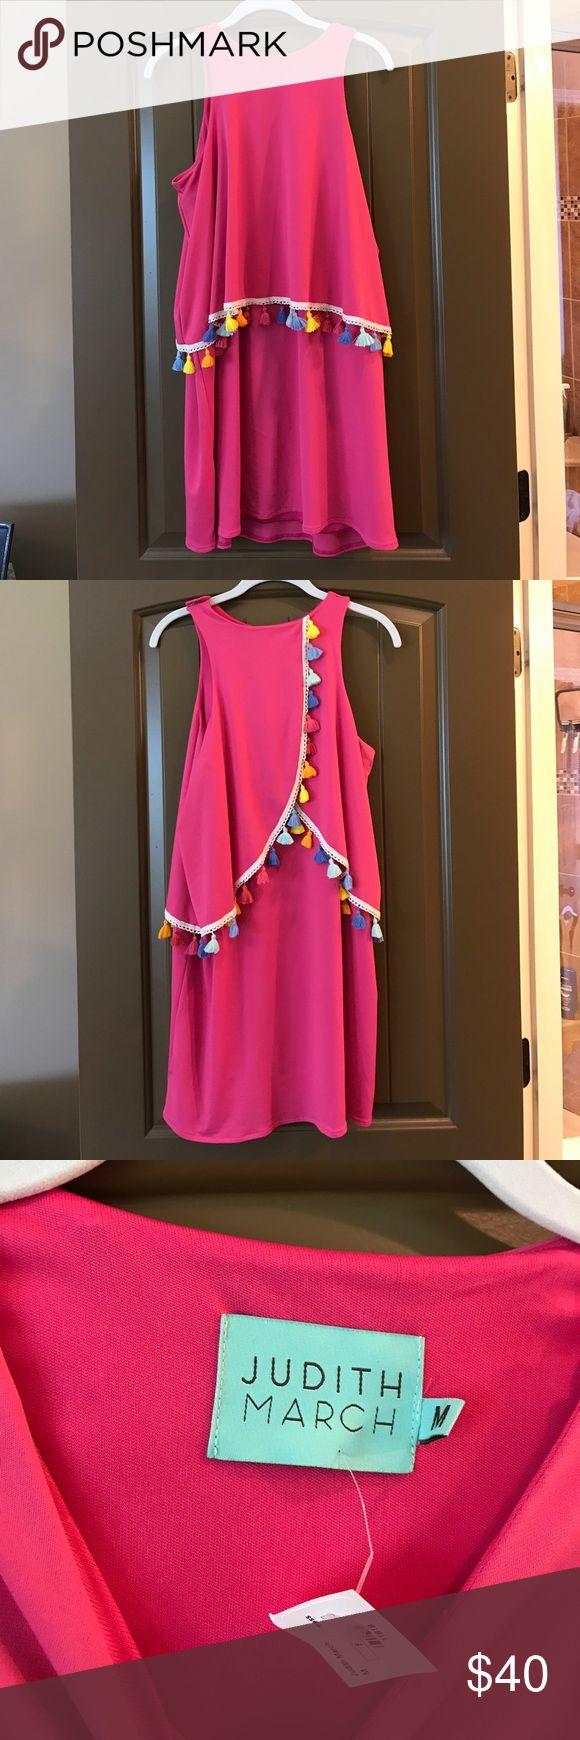 NWT Judith March pink Pom Pom dress size Medium NWT Judith March pink Pom Pom dress. Size Medium. SO CUTE!!! Judith March Dresses